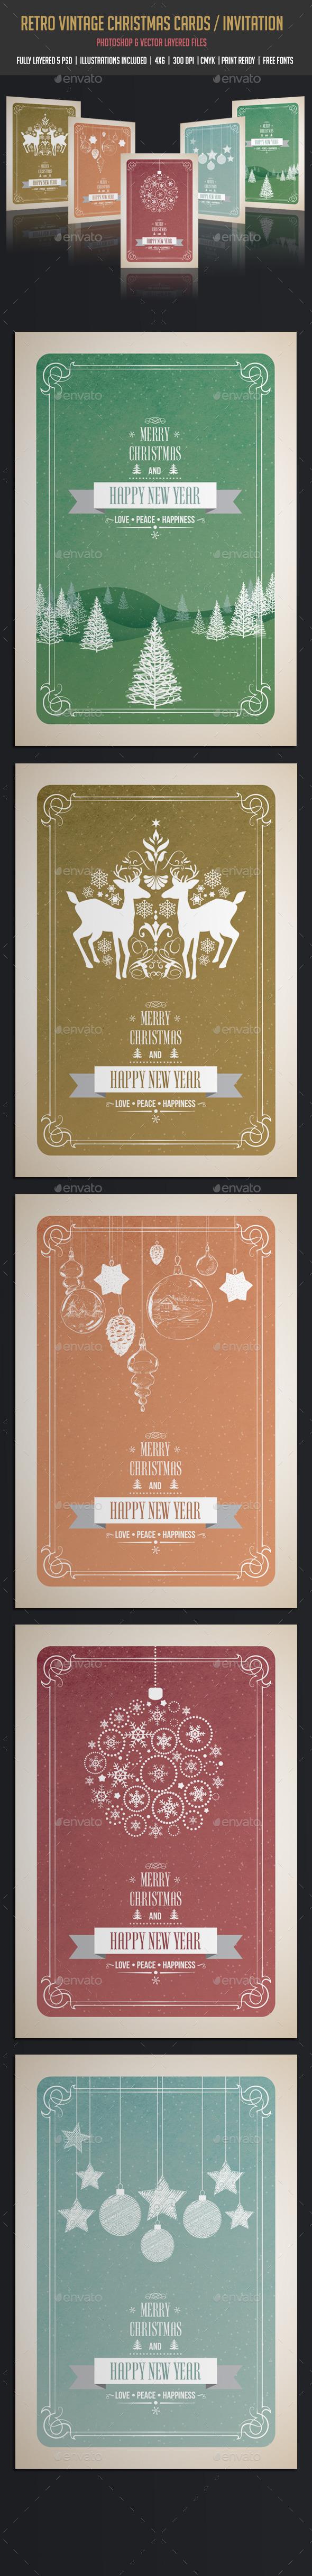 Vintage & Retro Christmas Cards / Invitation - Cards & Invites Print Templates